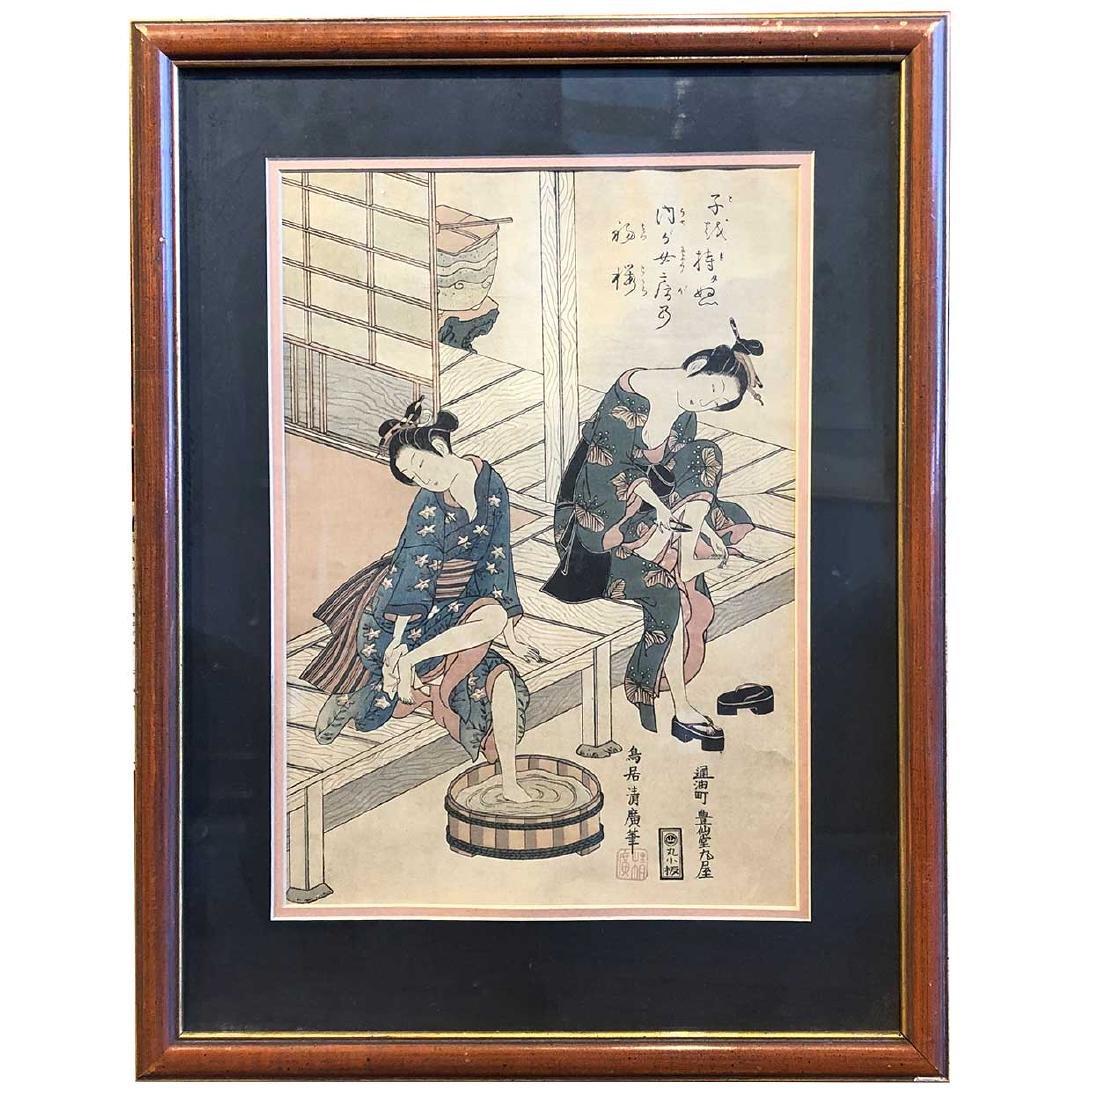 KIYOHIRO TORII Japanese Woodblock Geisha in Bath House